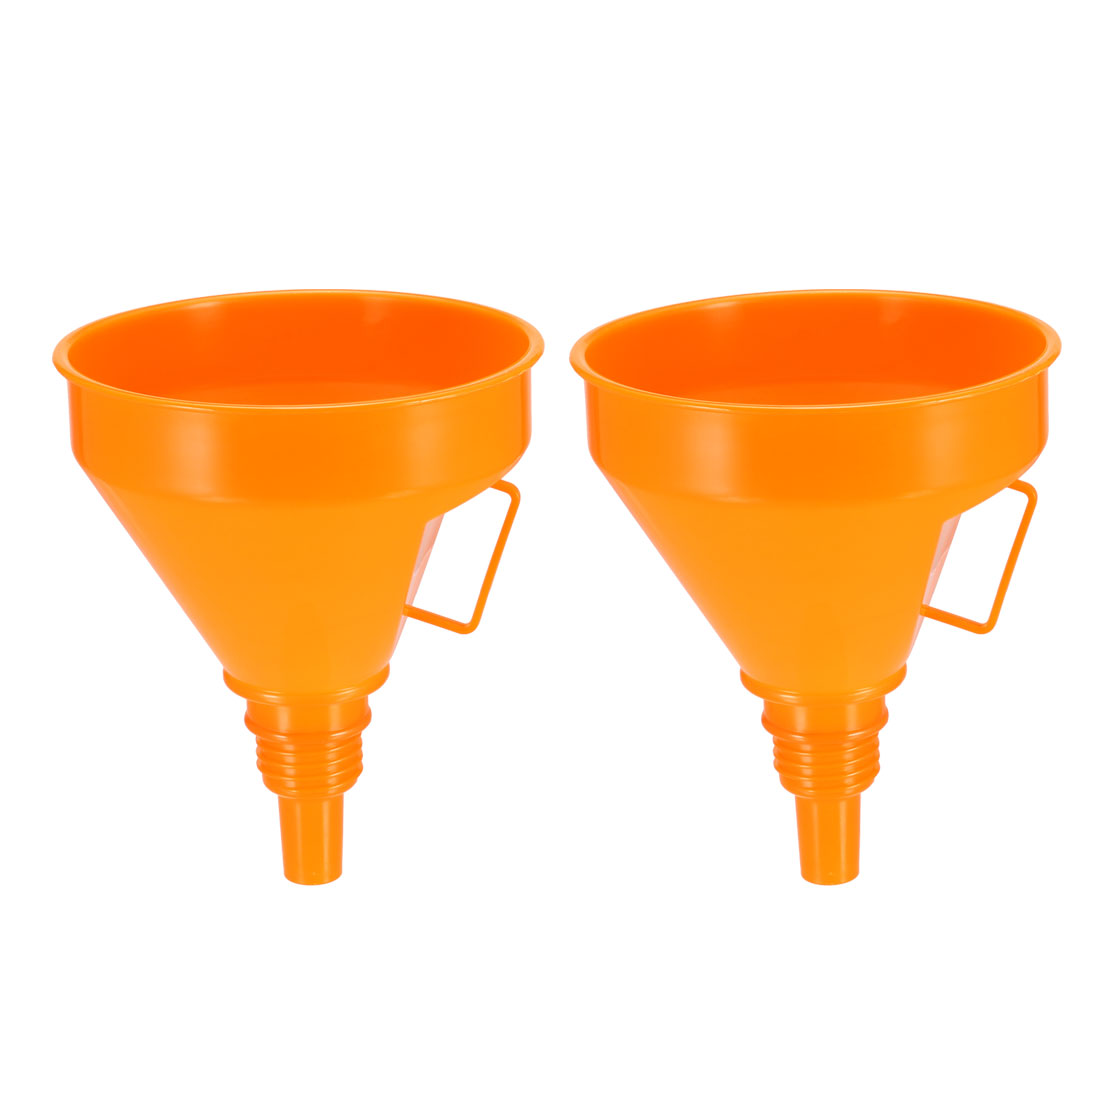 "Filter Funnel 5"" Plastic Feul Funnel Orange for Engine Oil Water Fuel 2pcs"